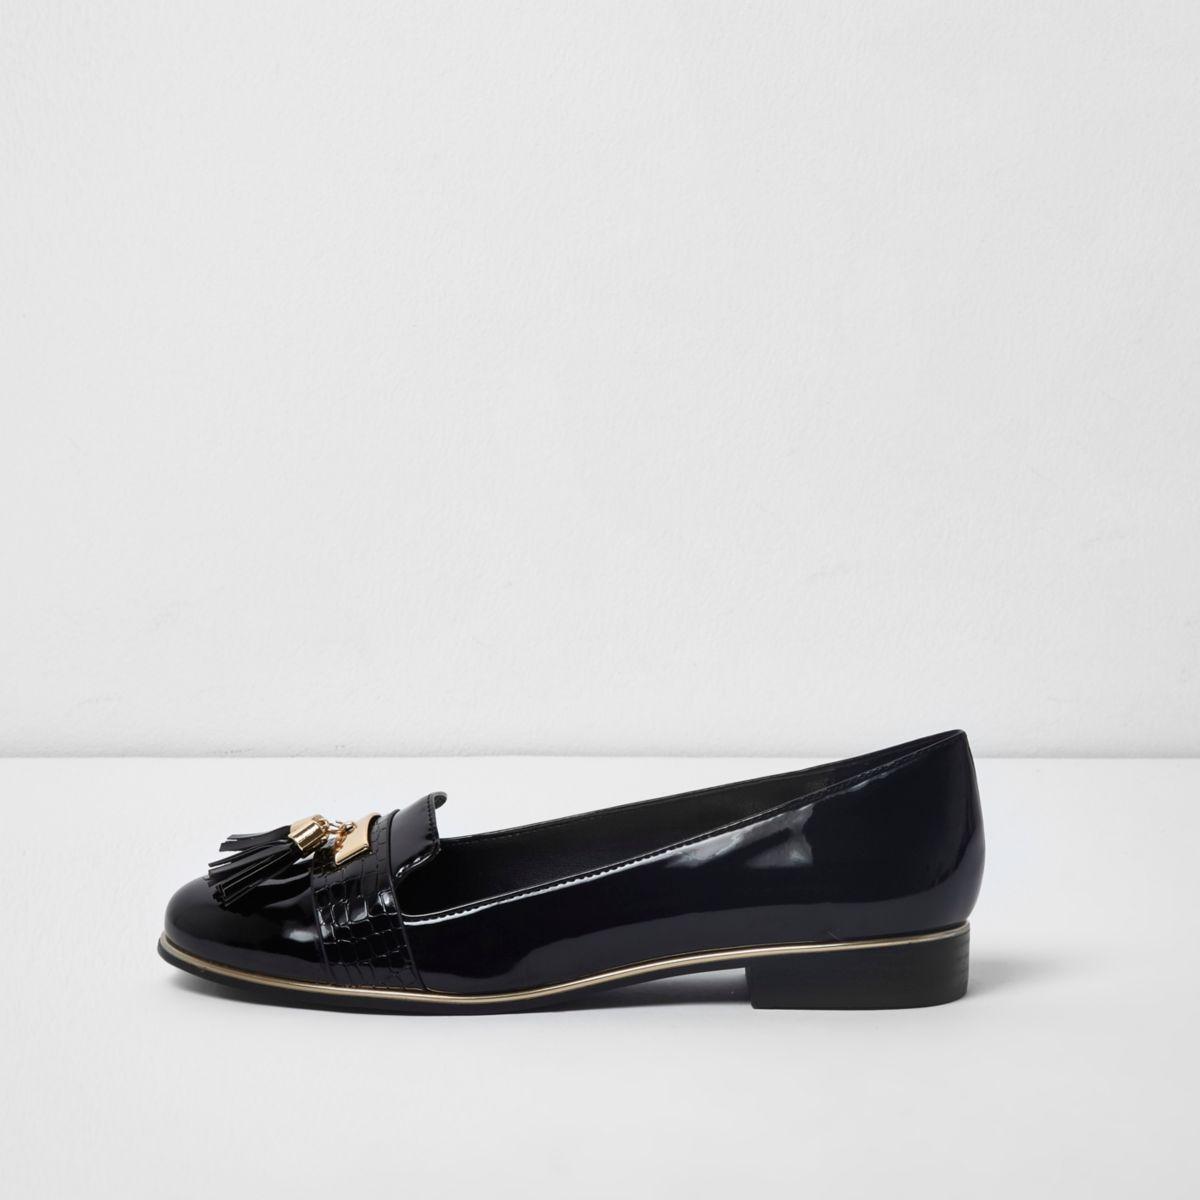 Black tassel patent loafers